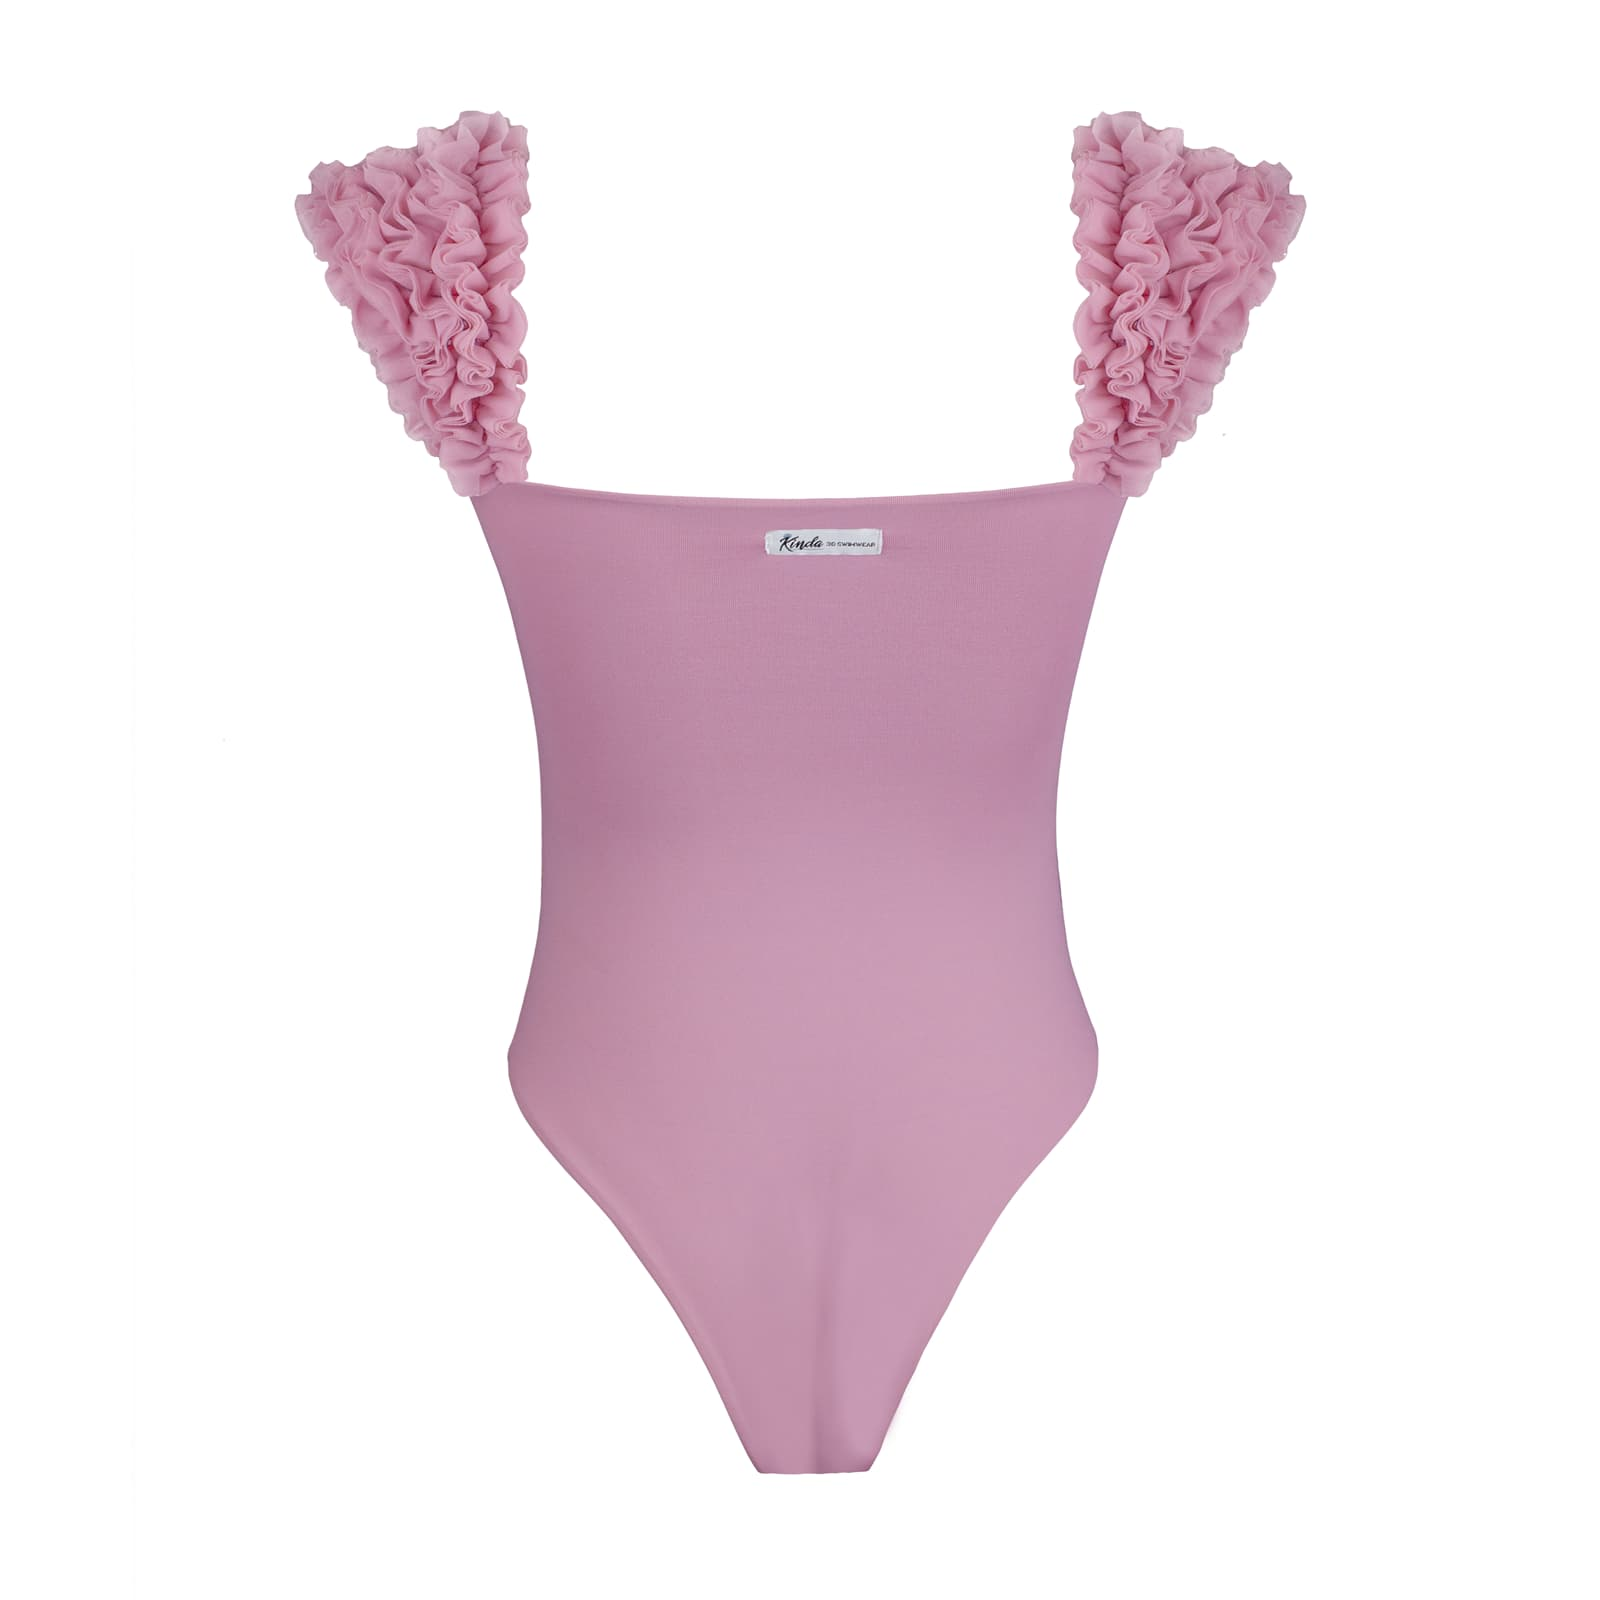 Grace Kinda 3D Swimwear swimsuit bikini with ruffles